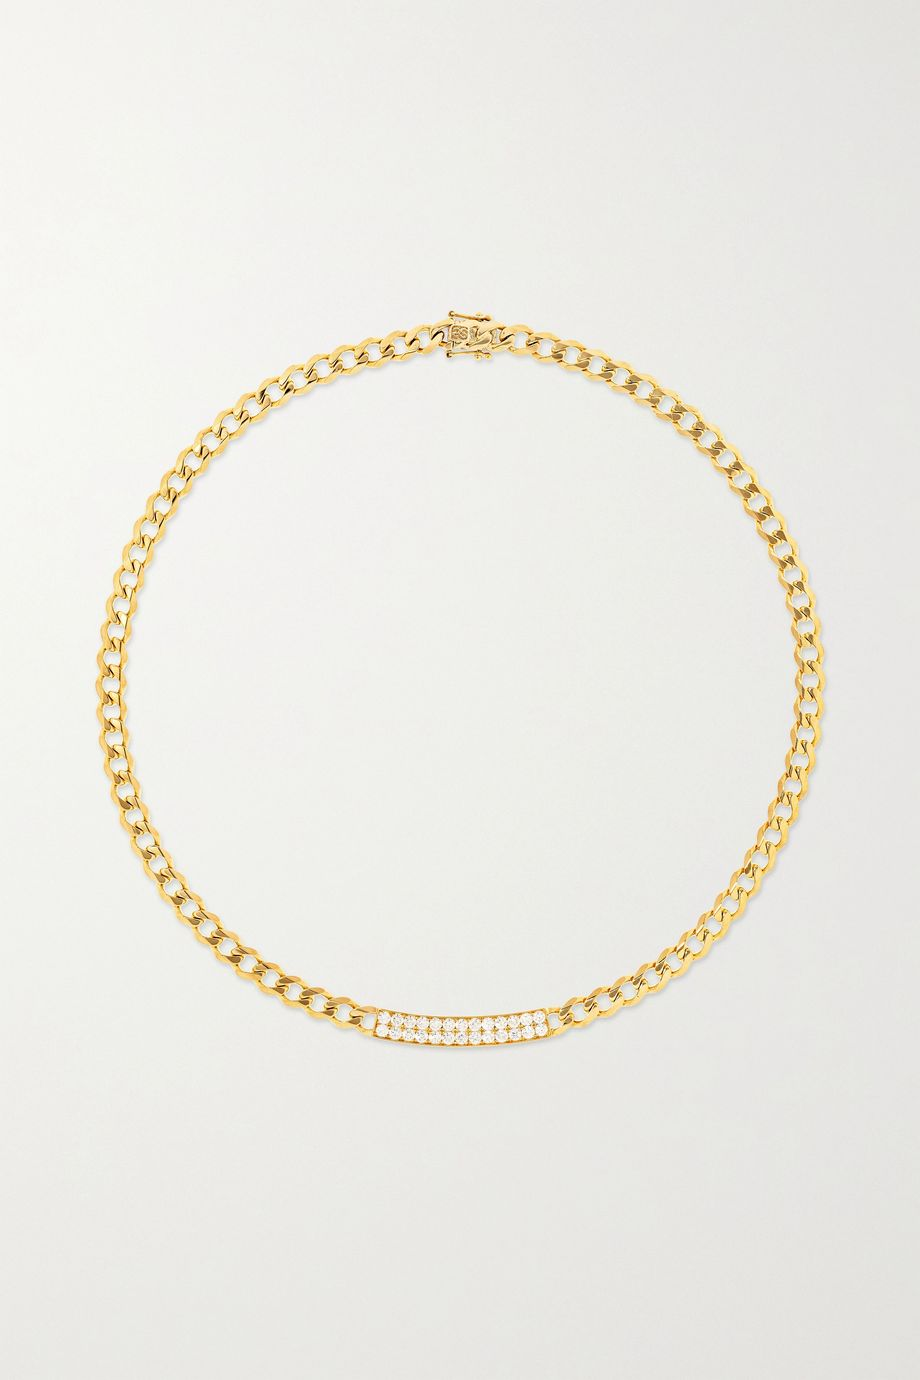 Sydney Evan ID Bar 14-karat gold diamond necklace